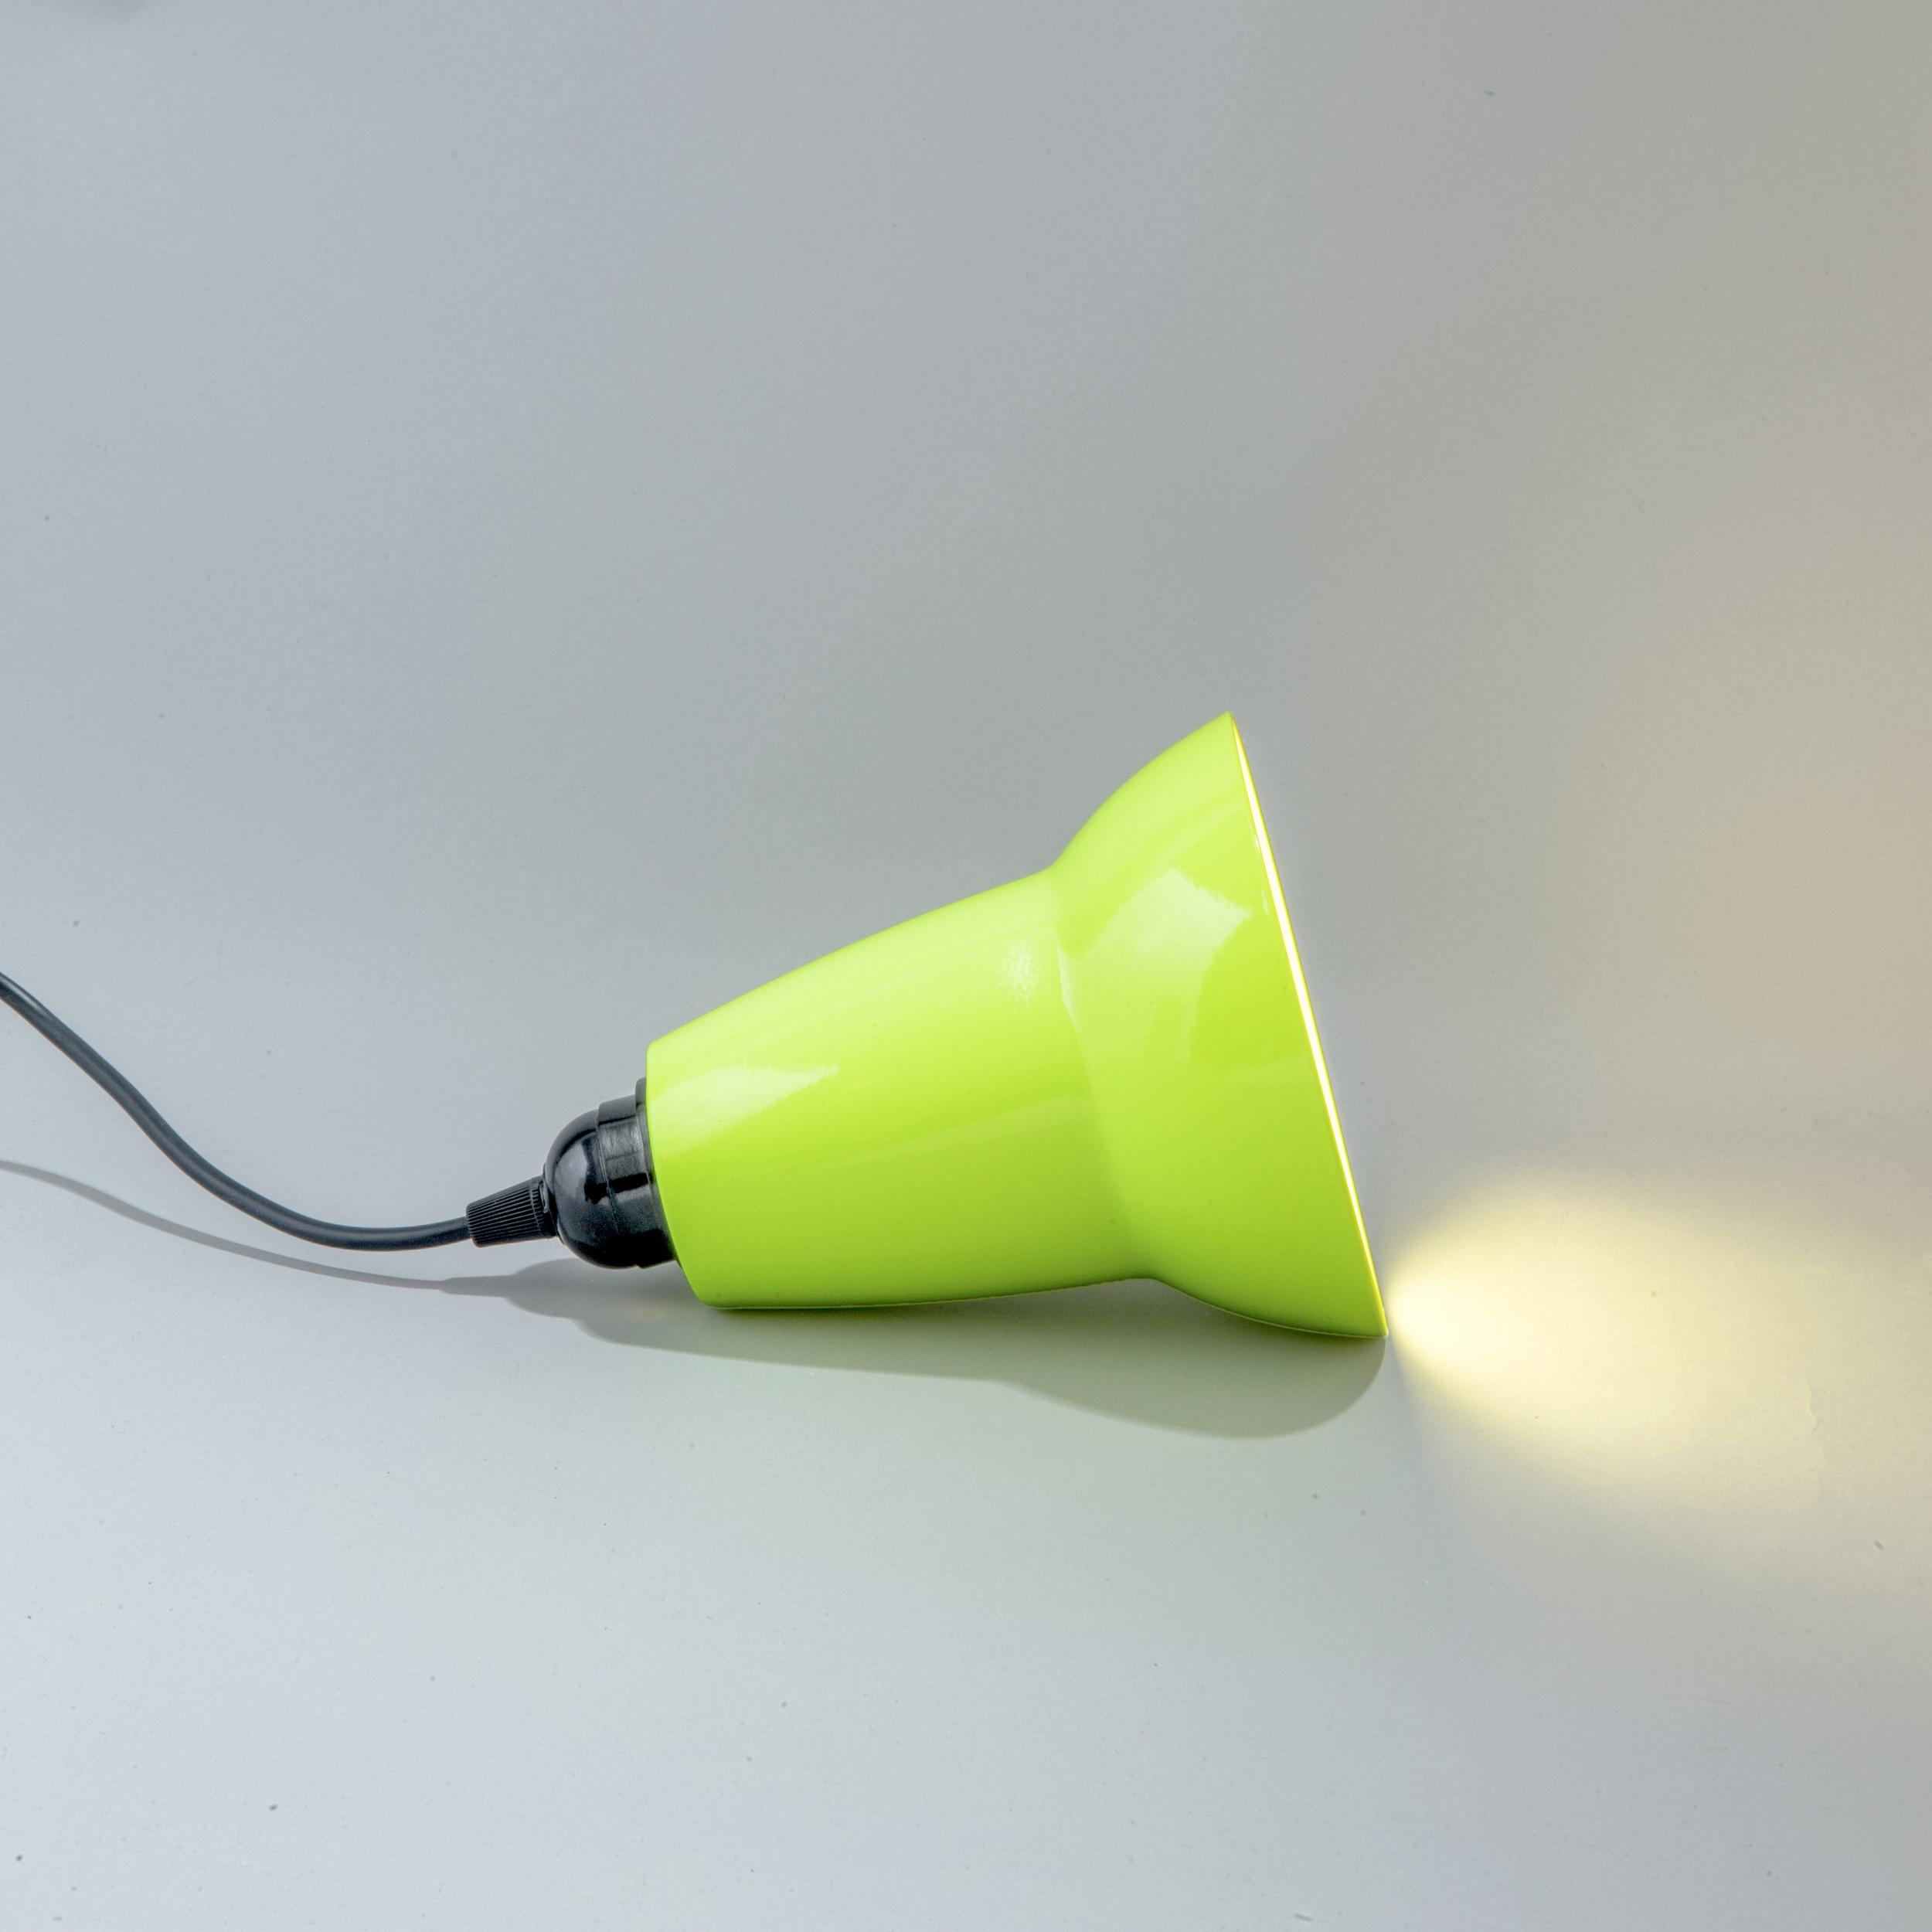 Roly Casper - Neon.UK Made£55.00